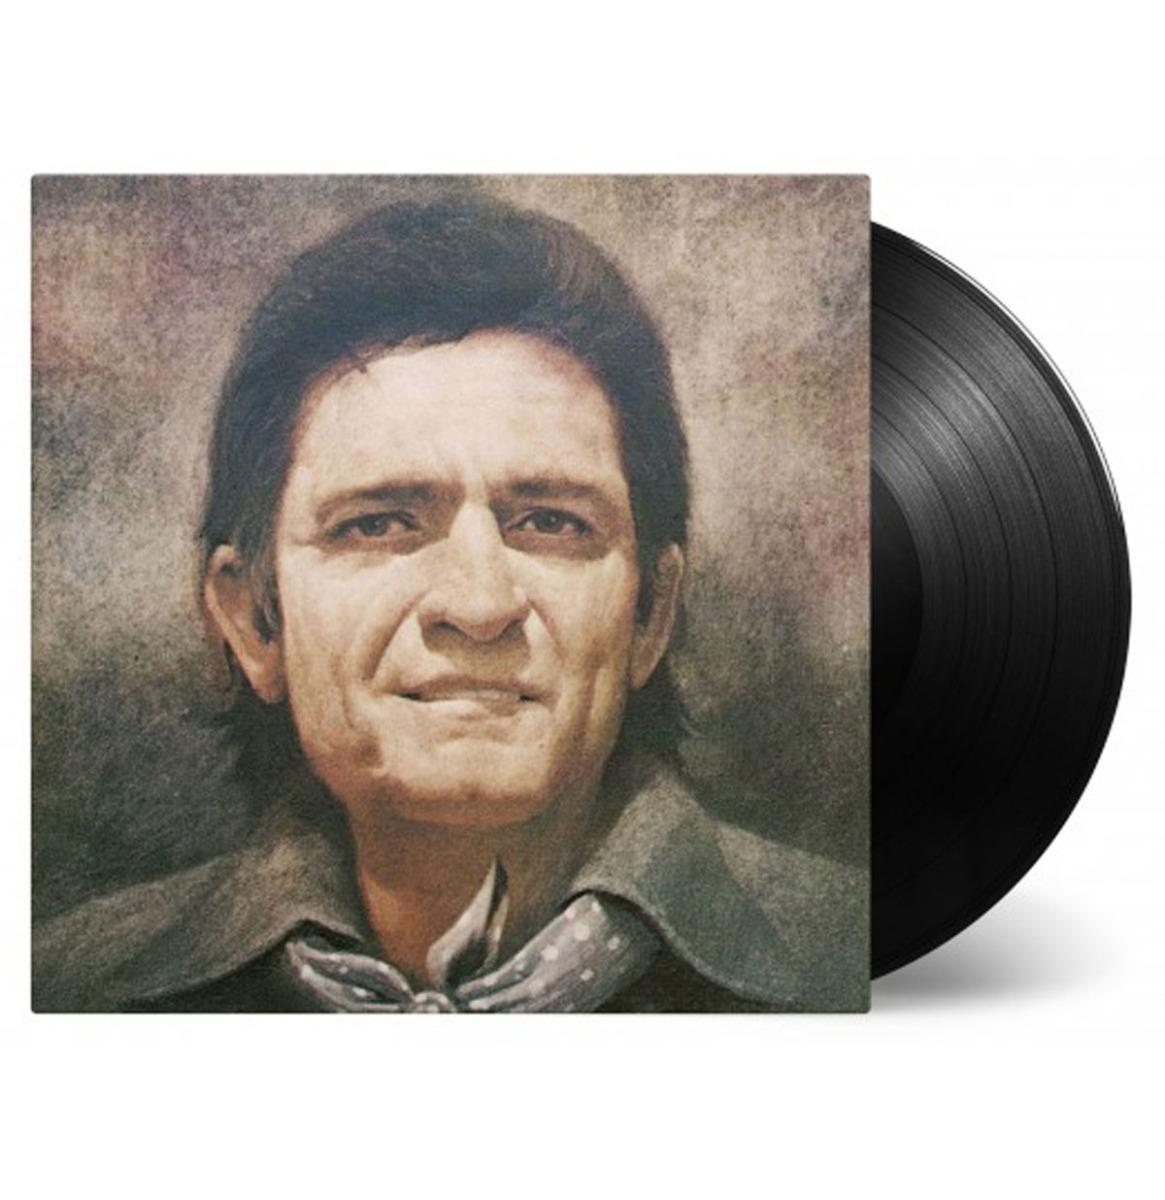 Johnny Cash - His Greatest Hits Volume II LP